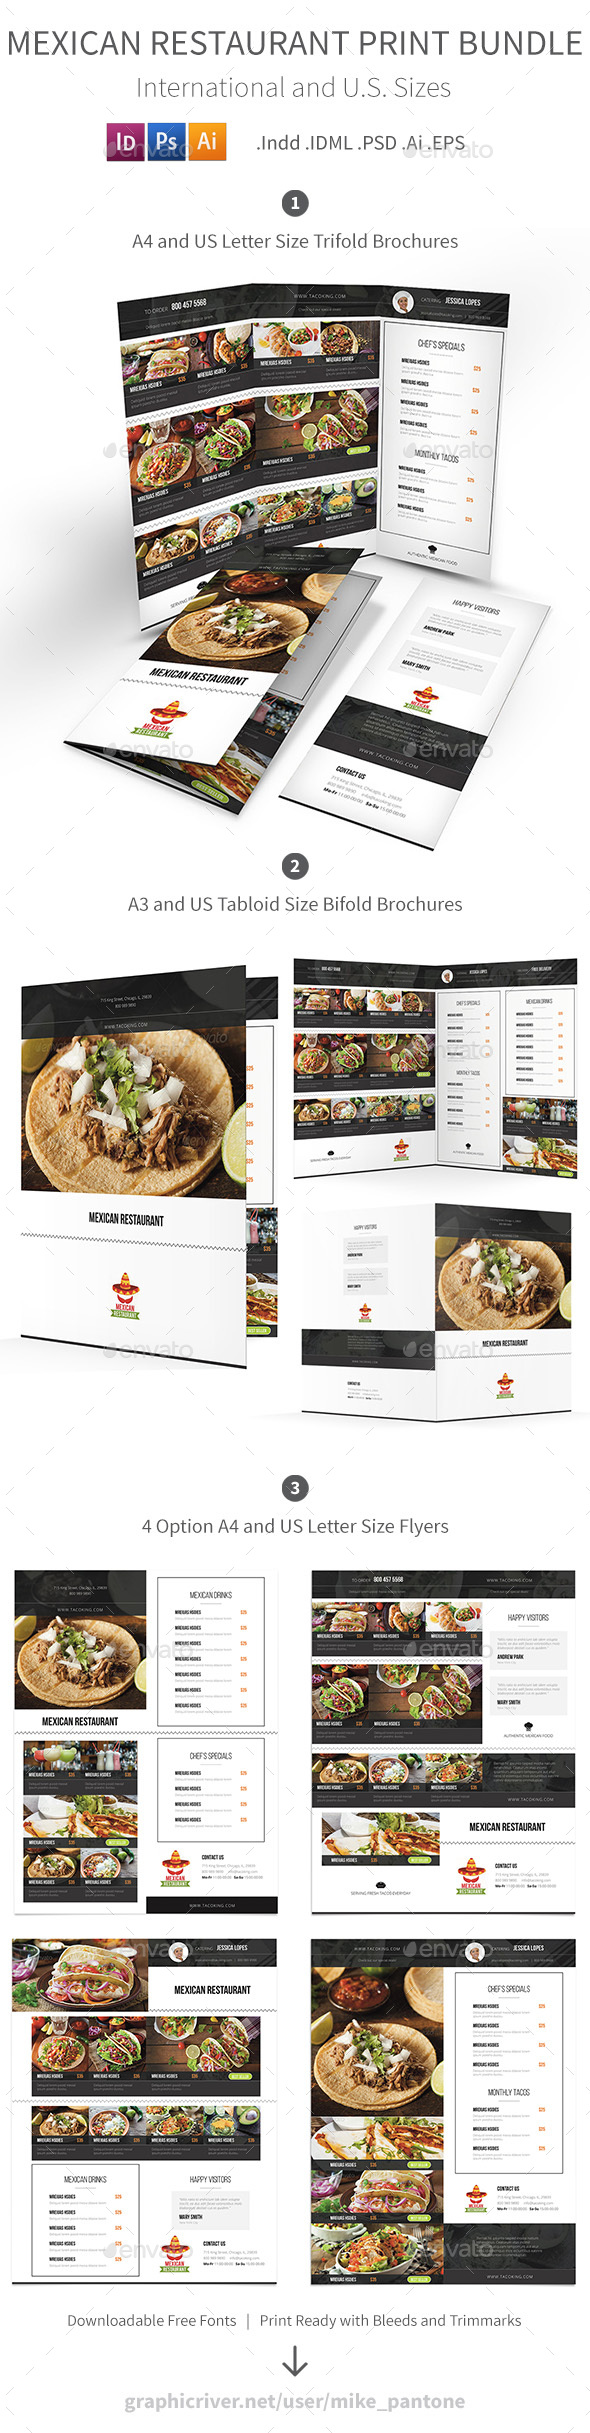 mexican restaurant menu print bundle by mike pantone graphicriver